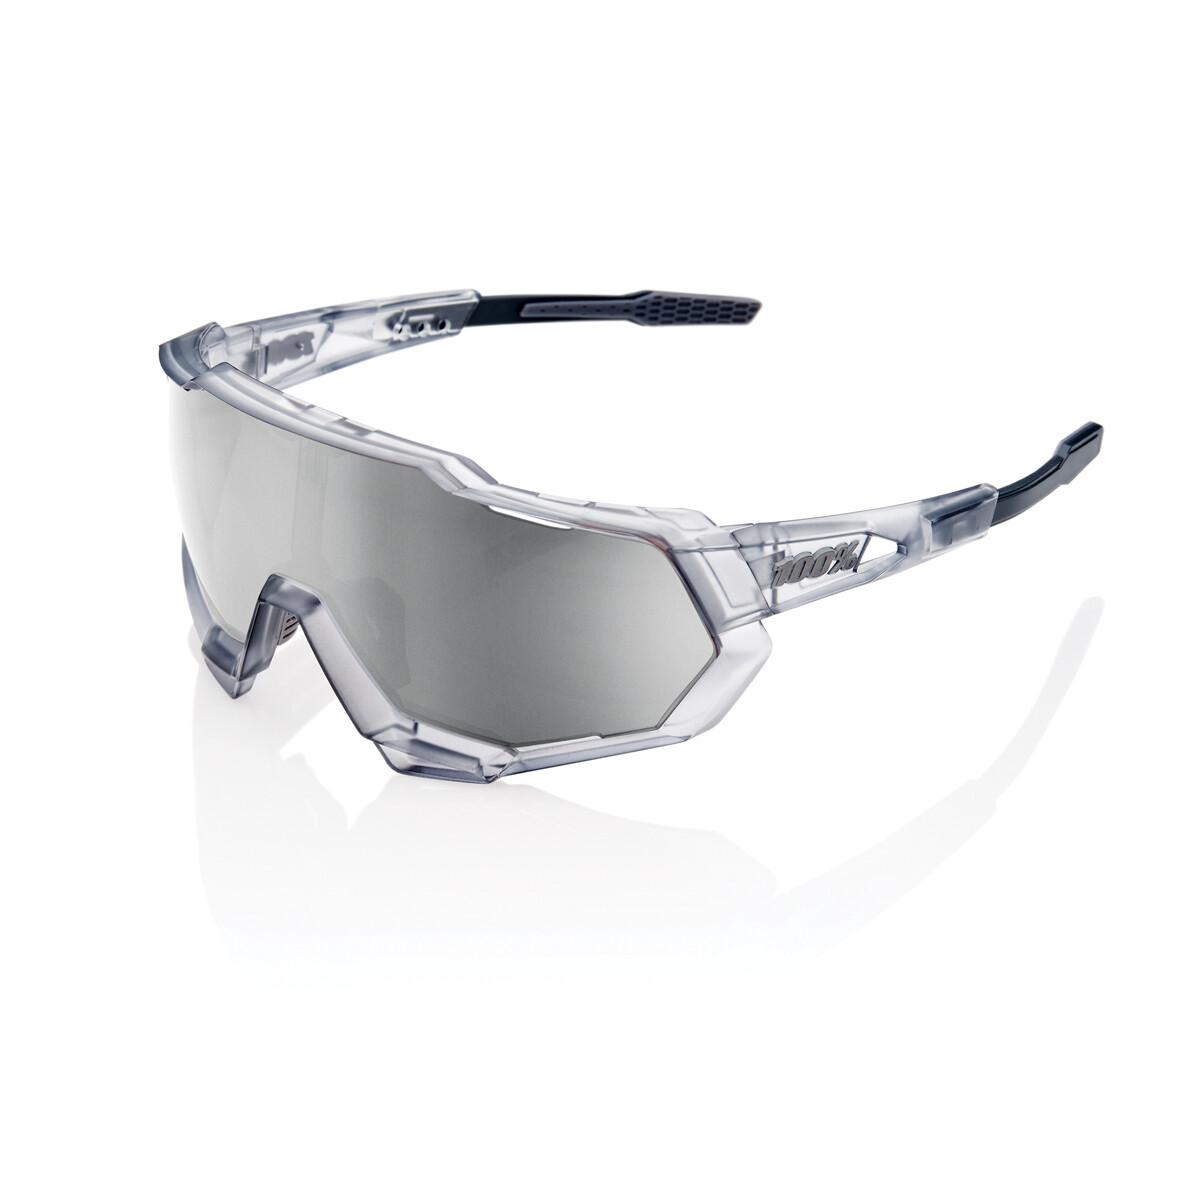 100% Speedtrap Hiper Matte Translucent Crystal Grey